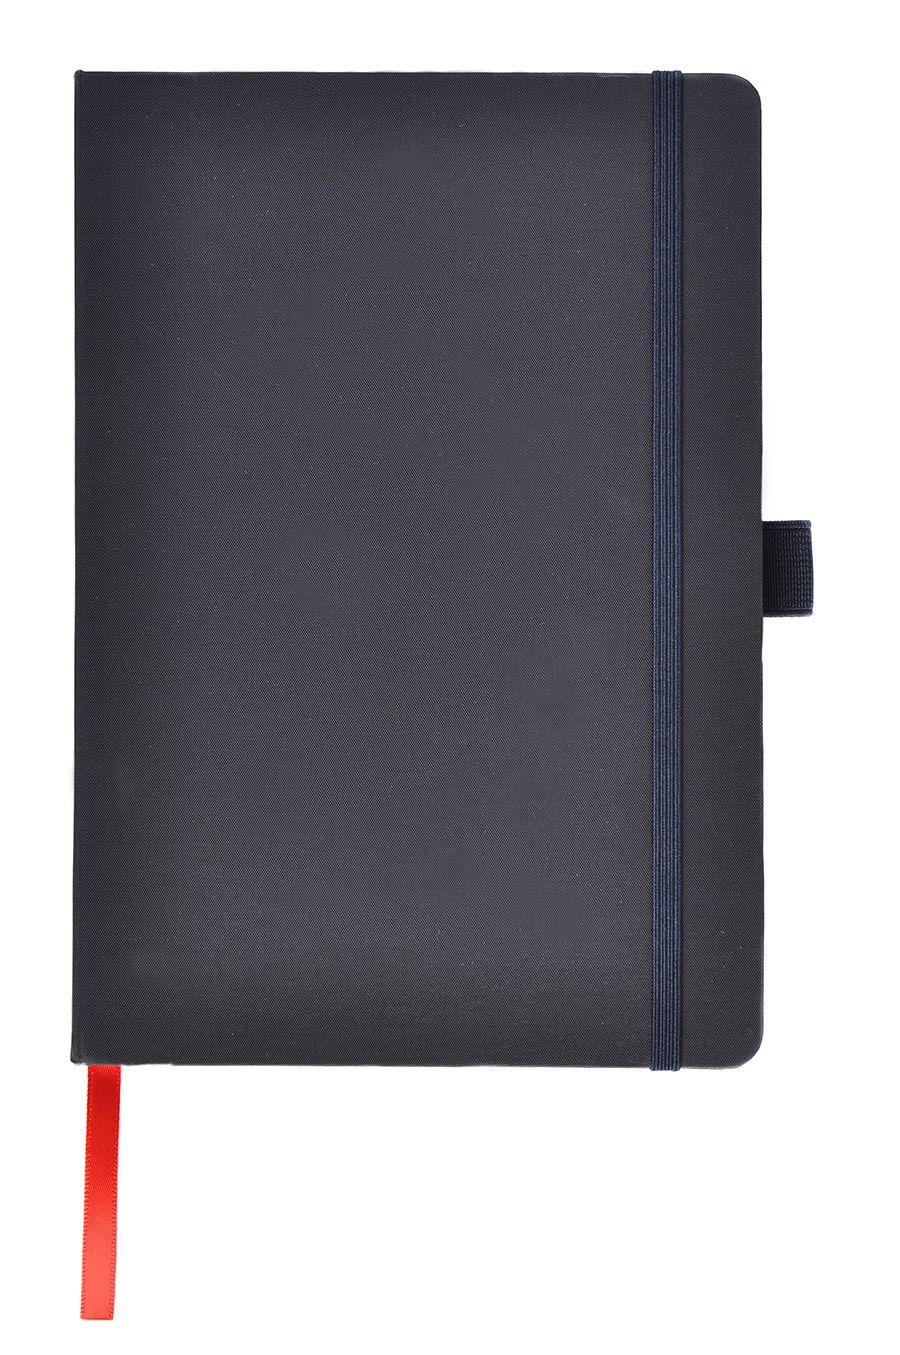 Bio-Degradable Notebook Cover Black